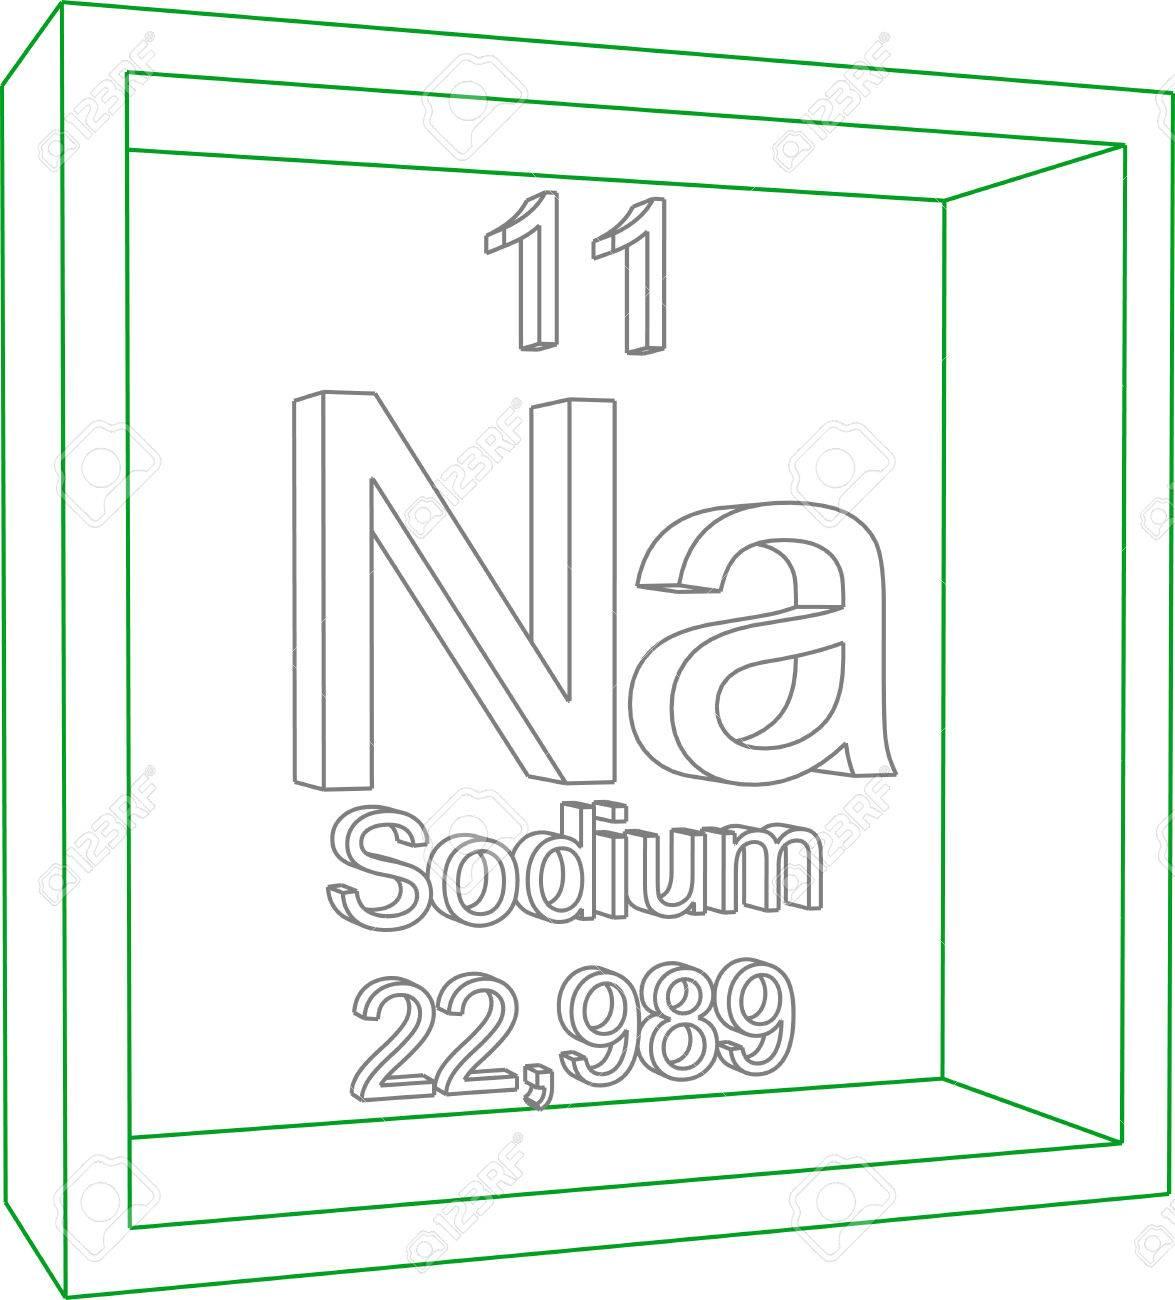 Periodic table of elements sodium royalty free cliparts vectors periodic table of elements sodium stock vector 57964857 urtaz Choice Image